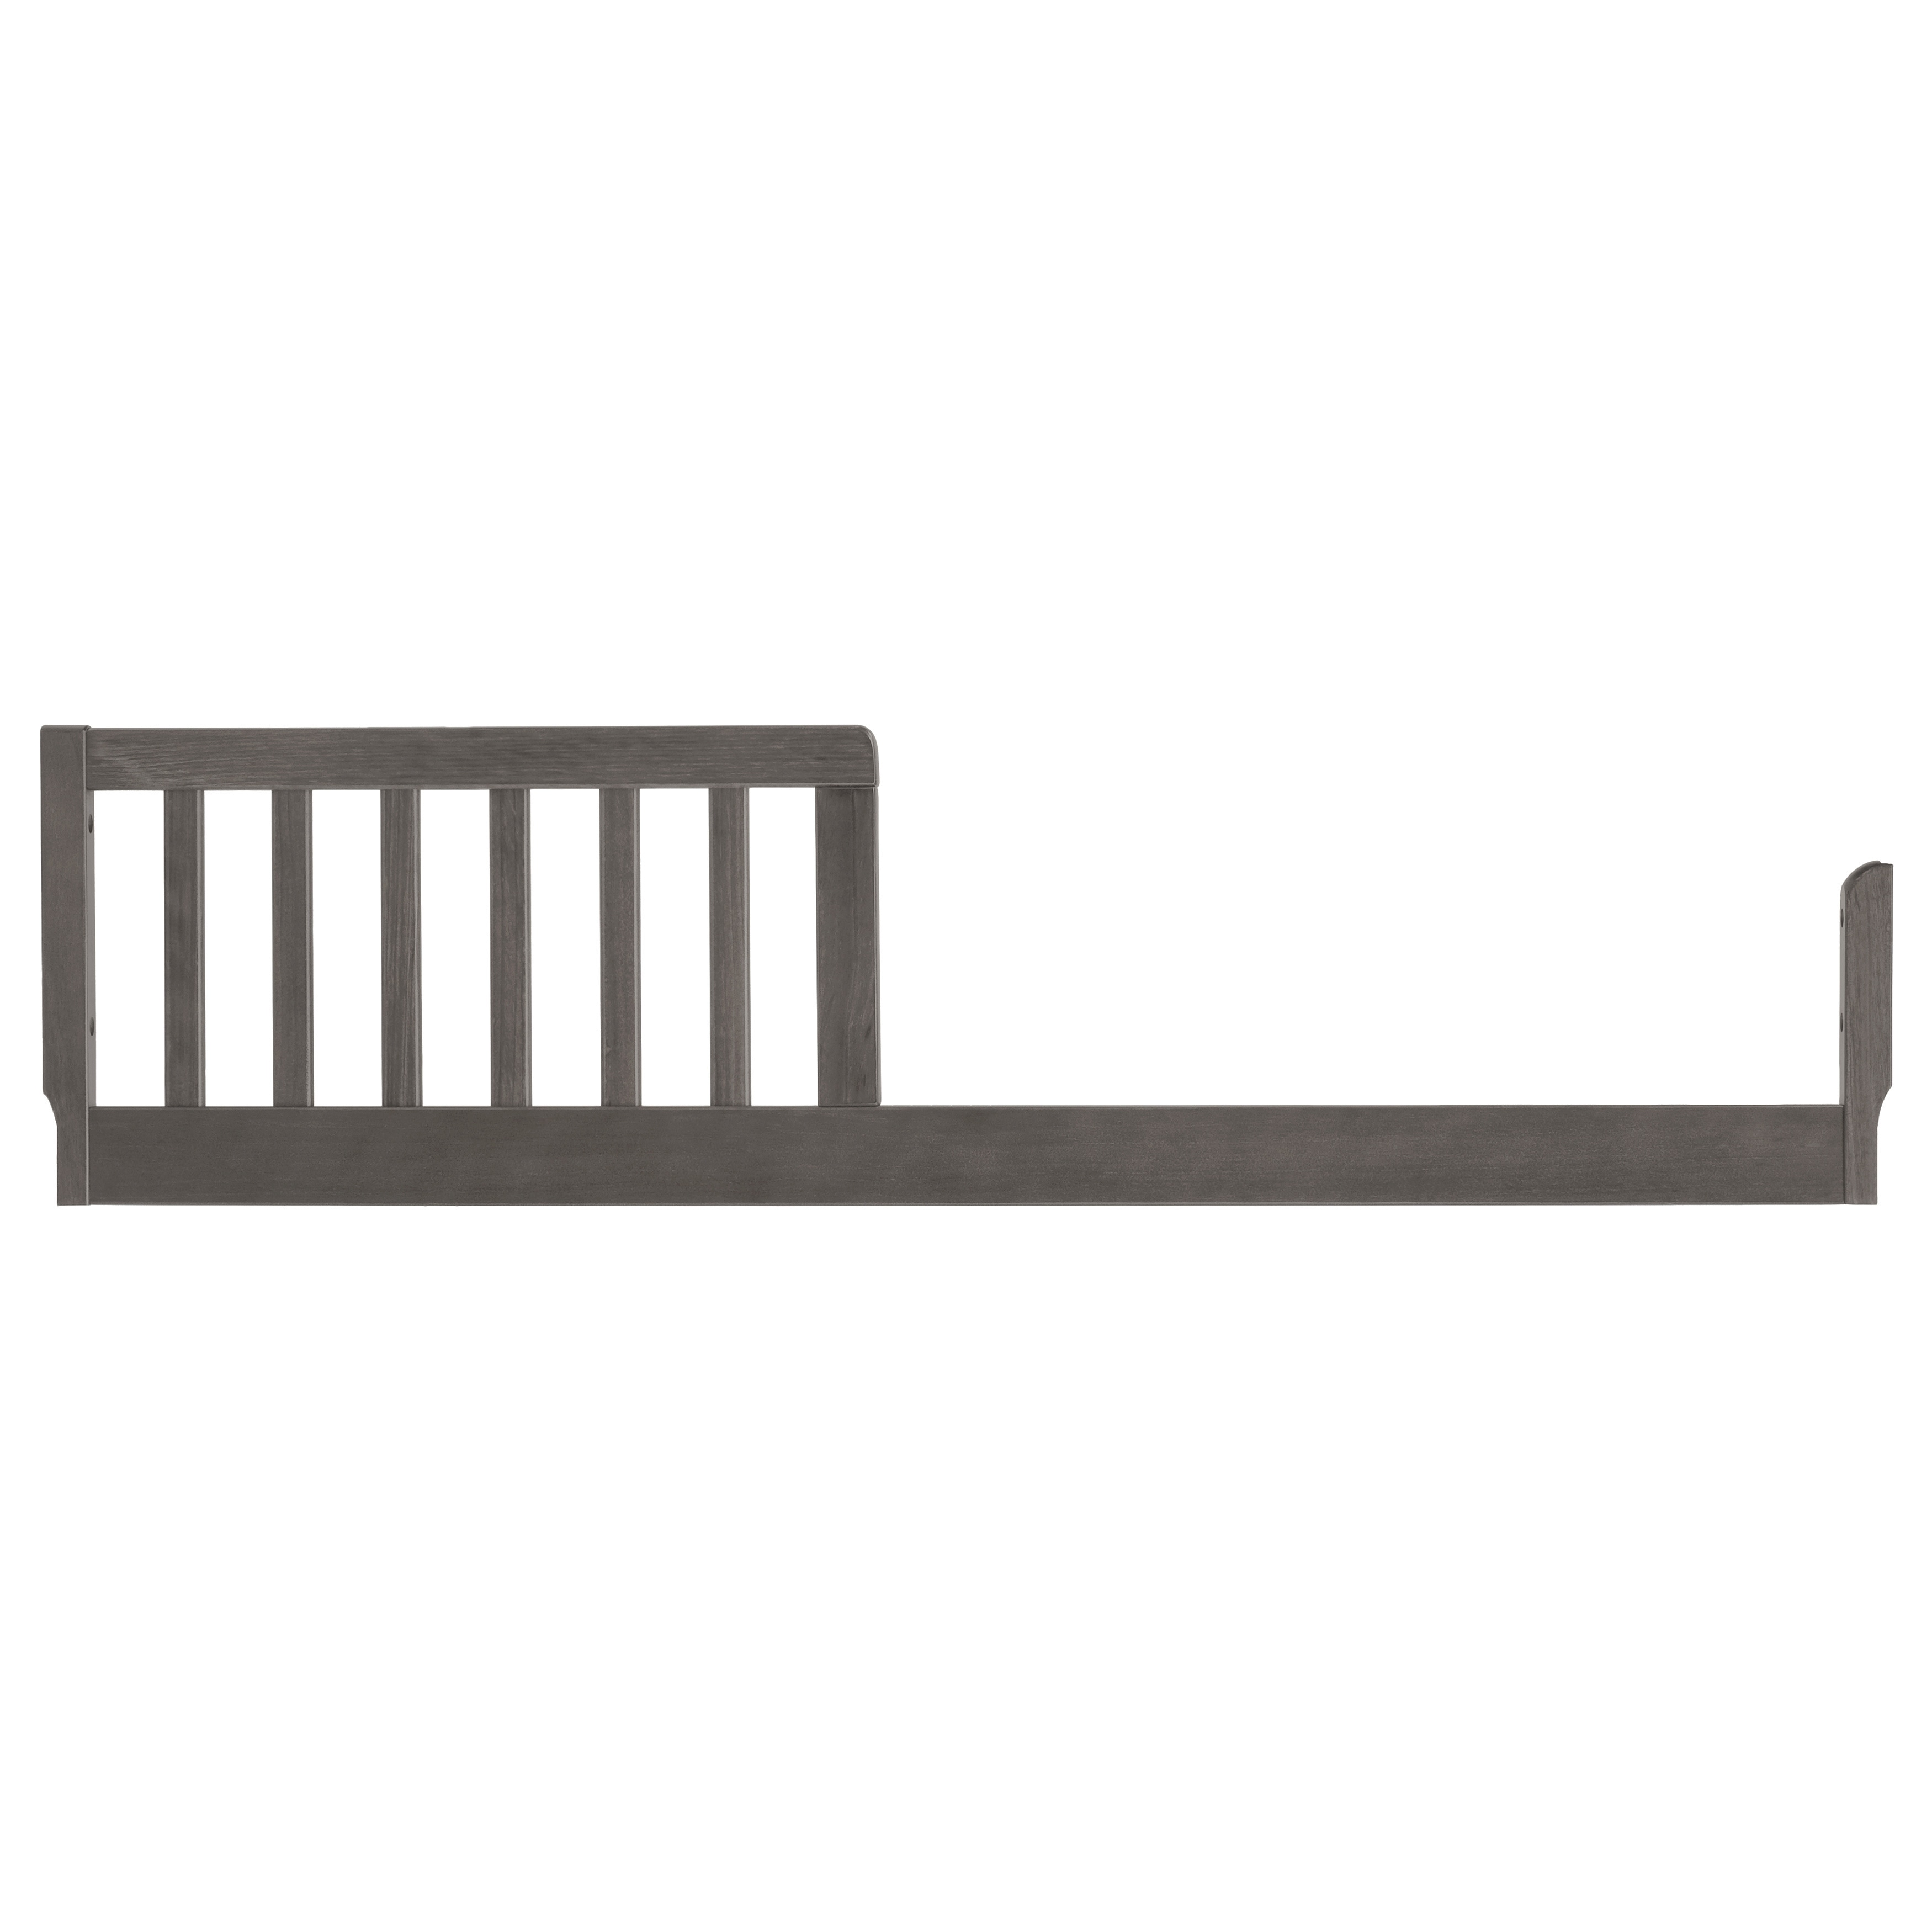 DaVinci Toddler Bed Coversion Kit (Slate), Grey